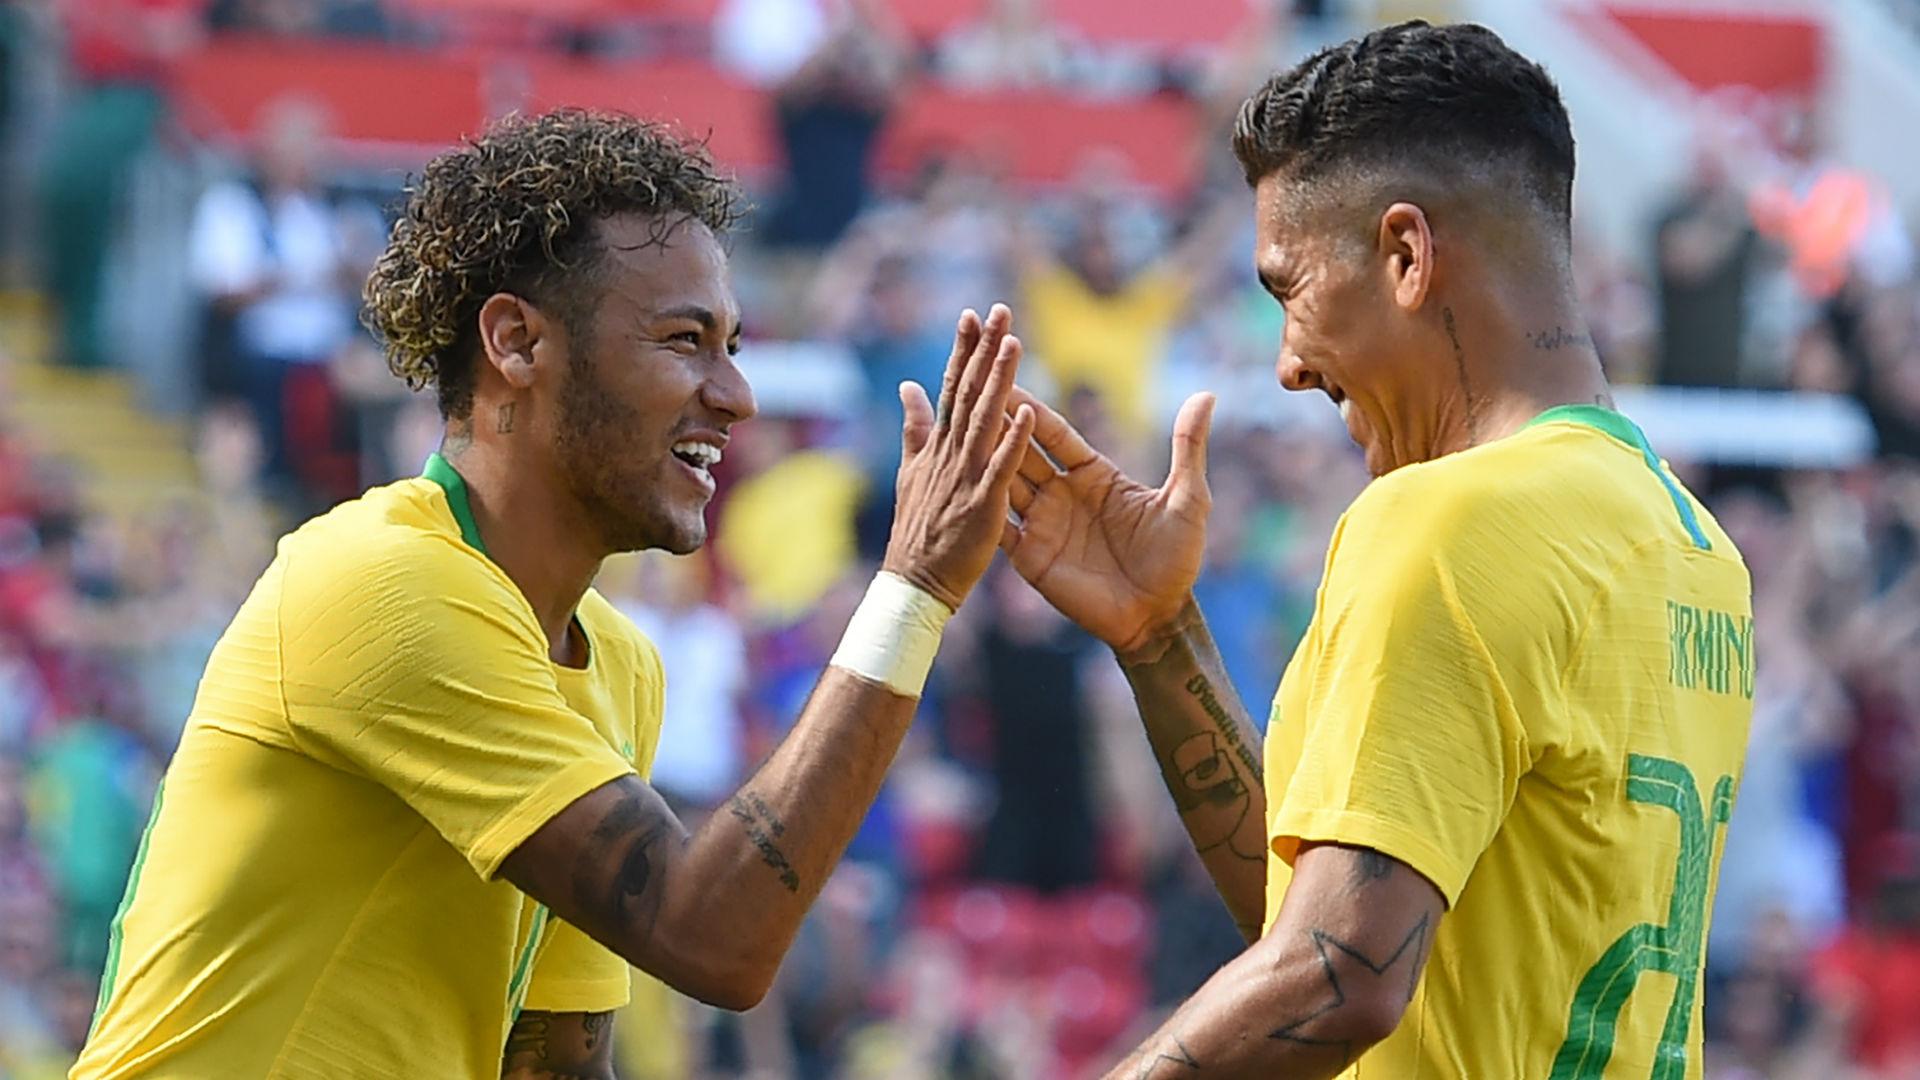 Neymar, Firmino, score as Brazil hand Croatia a commanding victory in a pre-World Cup friendly